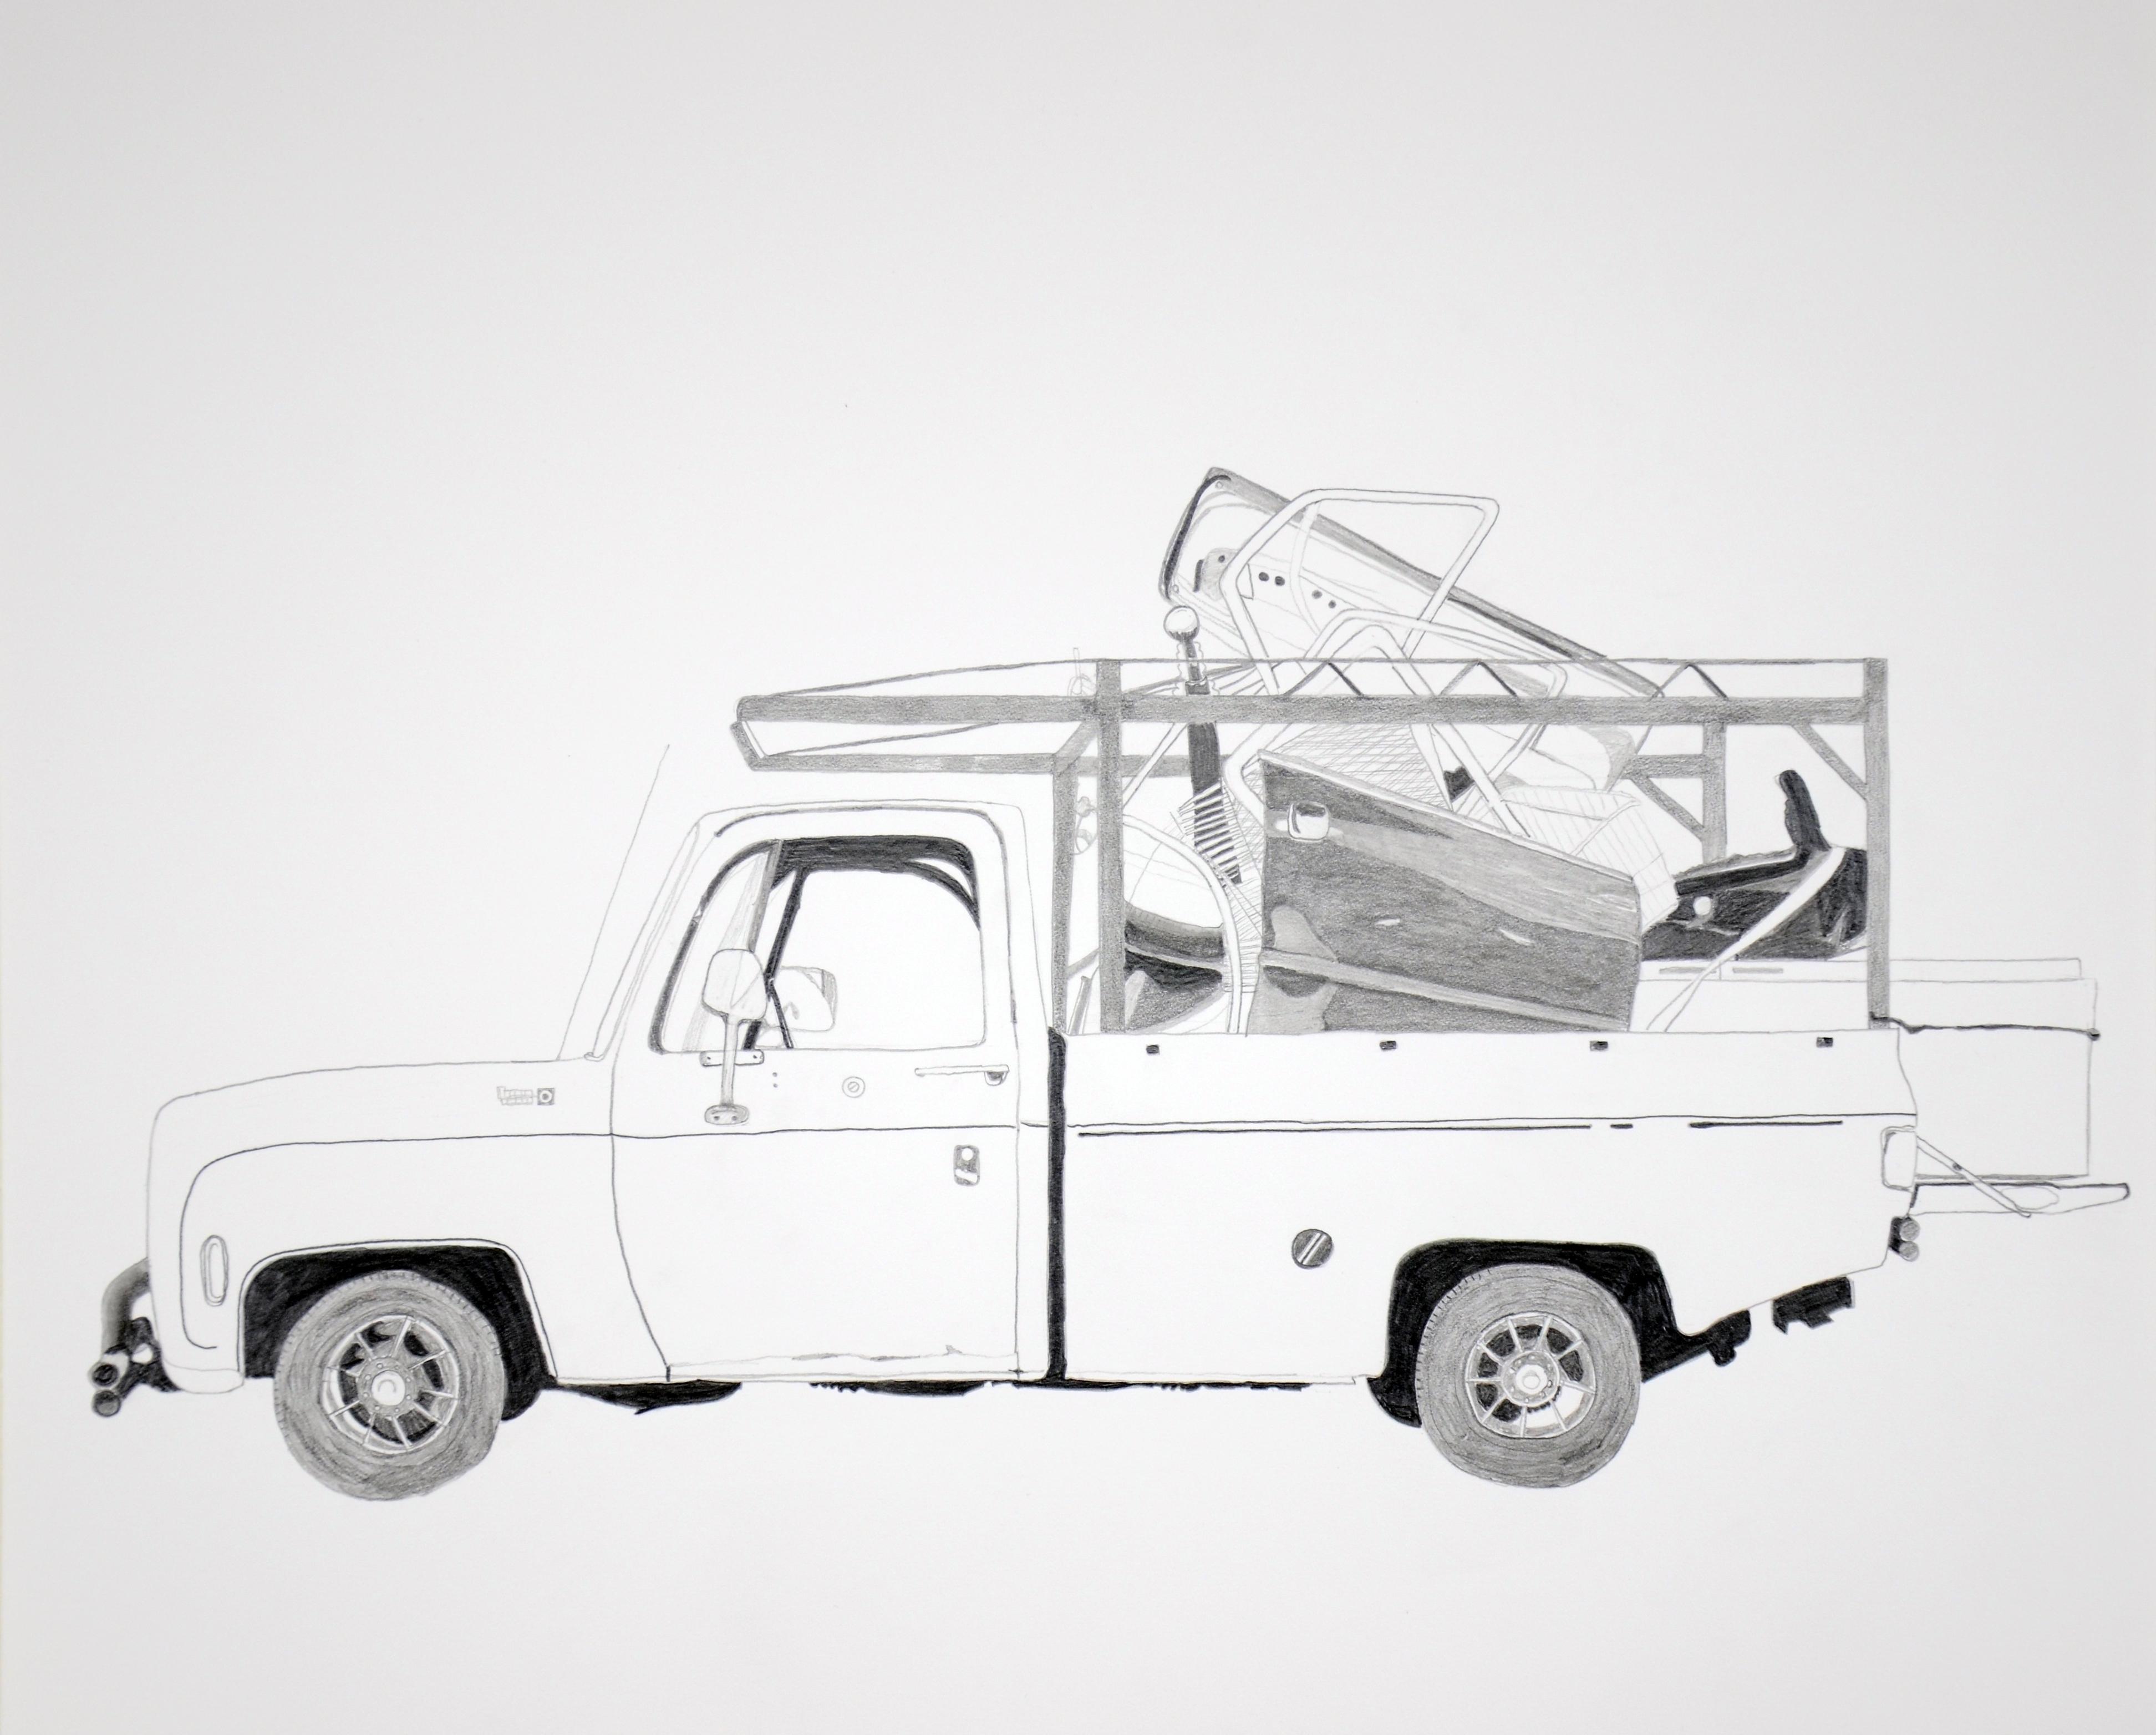 Truck_02